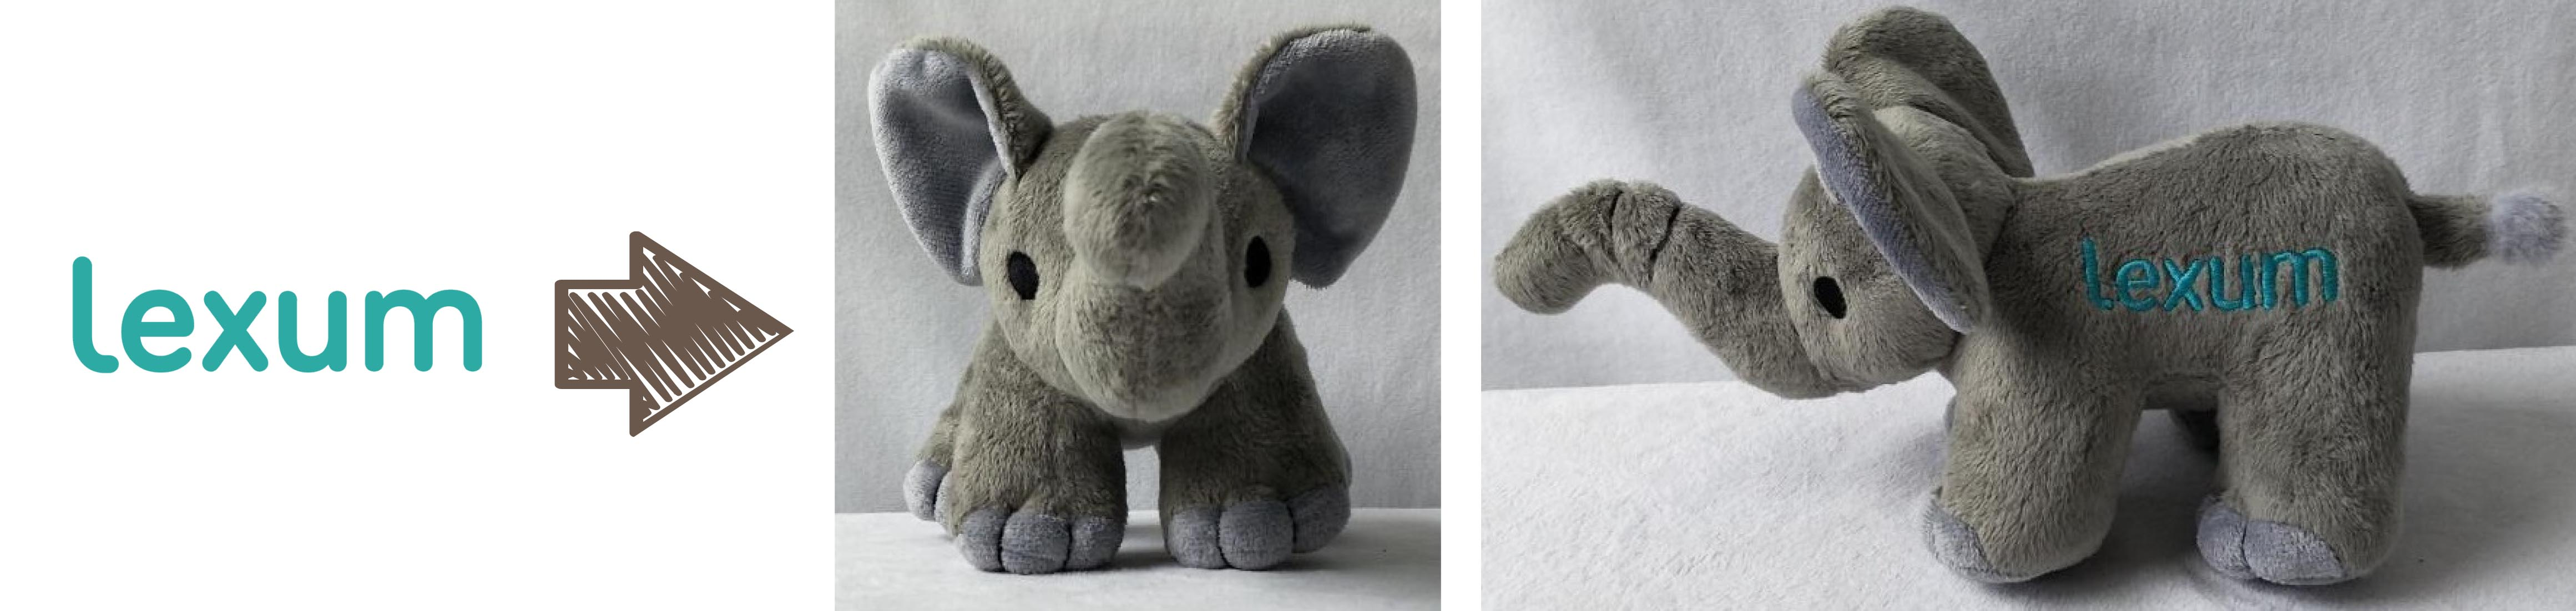 Lexum promotional stuffed animal